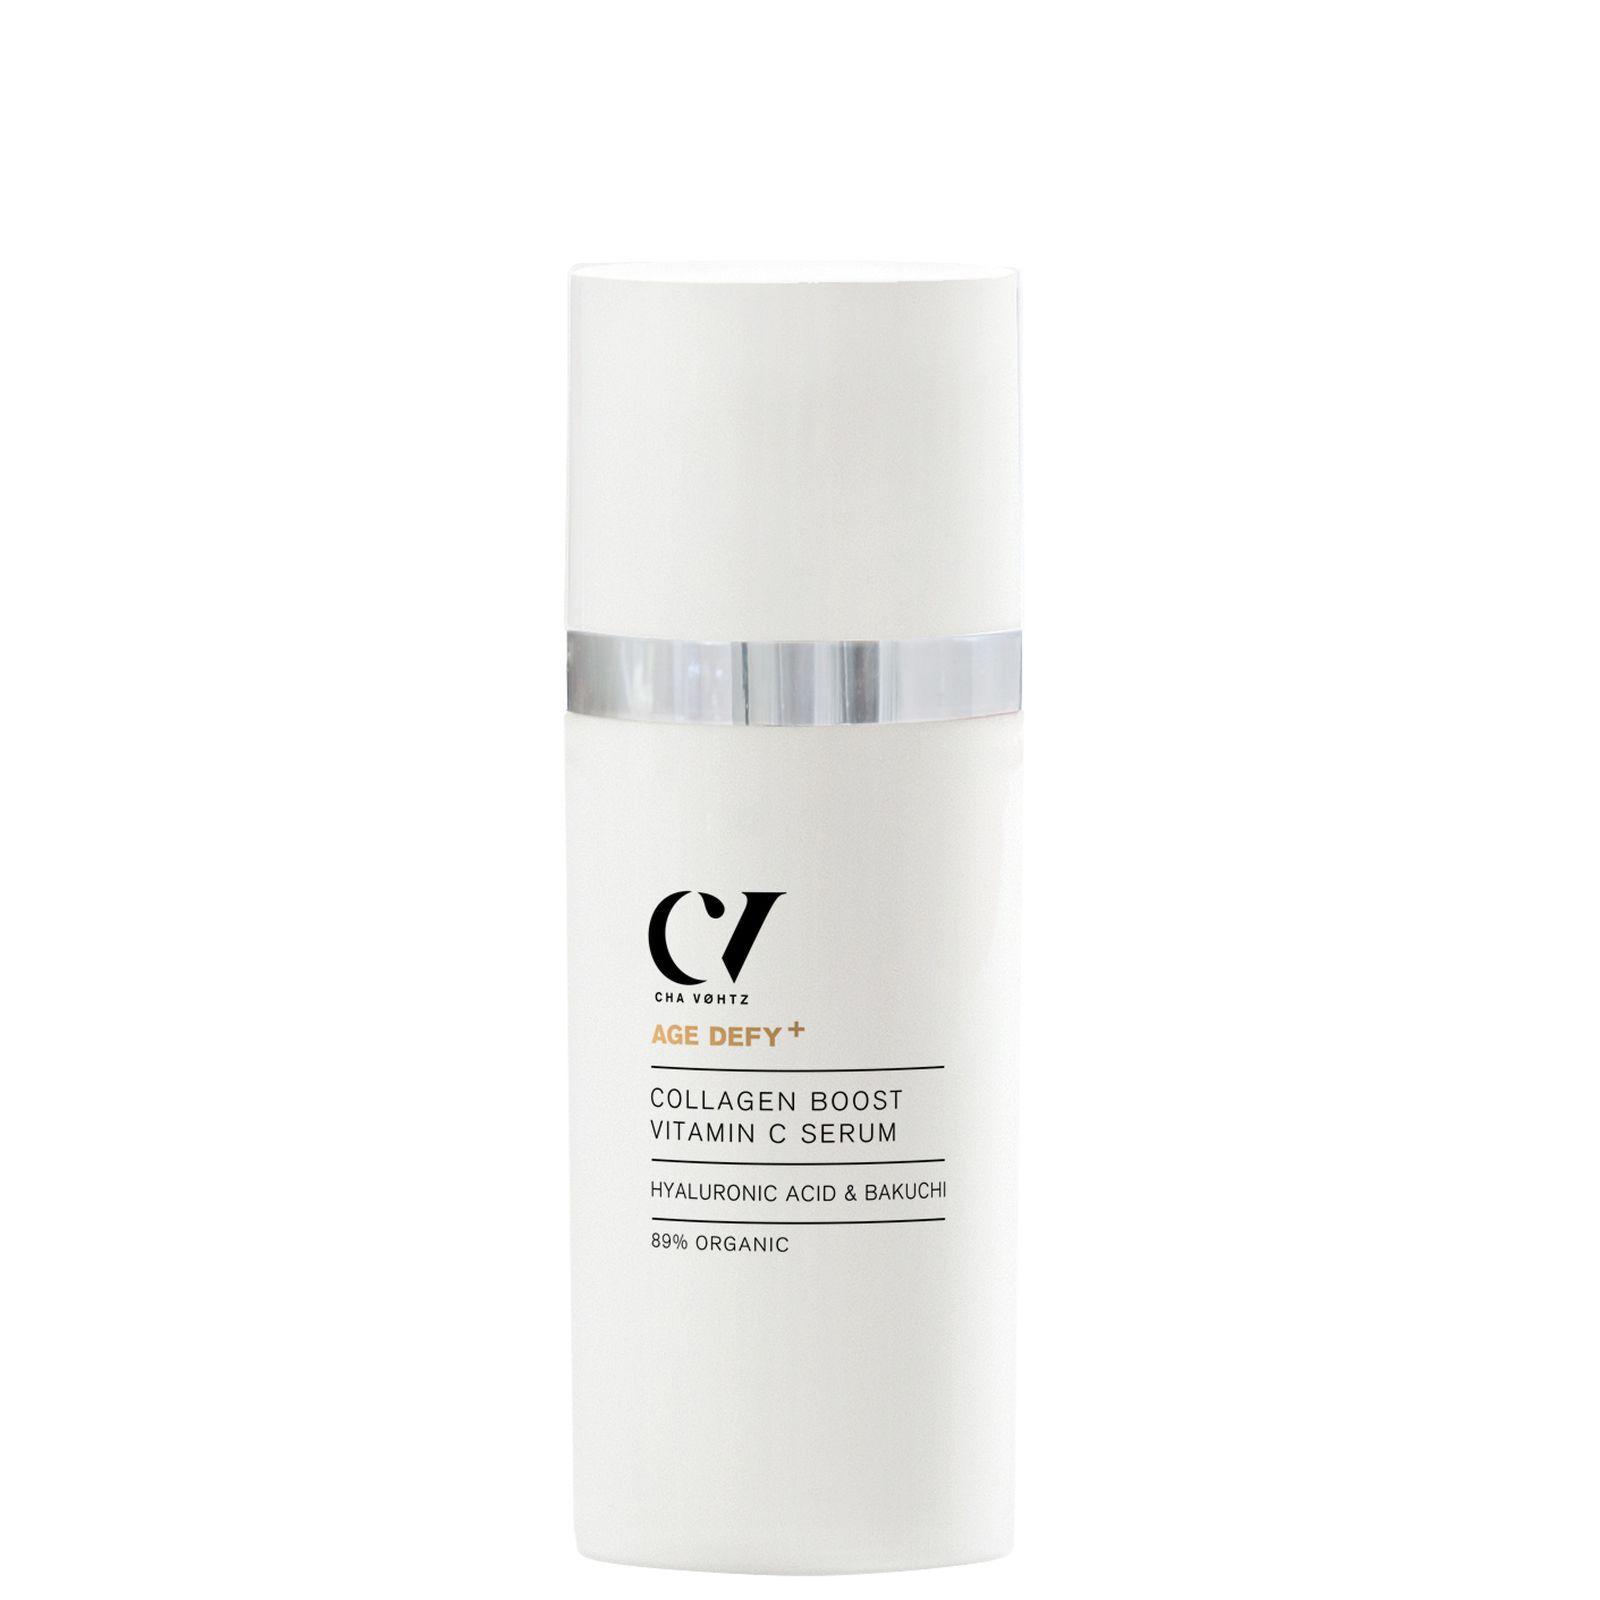 Green People - Skin Age Defy+ Collagen Boost Vitamin C Serum 30ml for Women